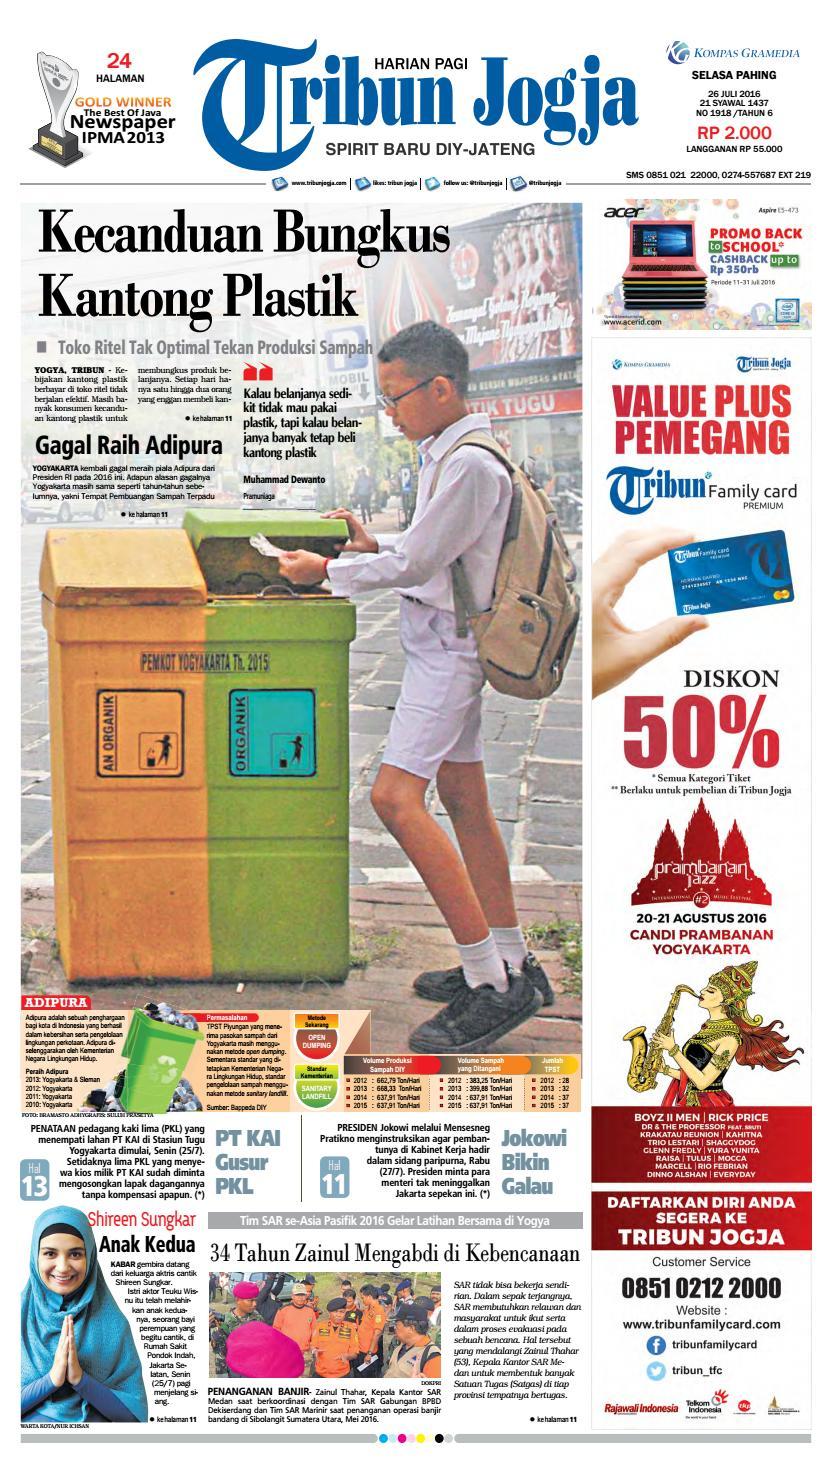 Tribunjogja 26 07 2016 By Tribun Jogja Issuu Produk Umkm Bumn Kapal Batok Lebak